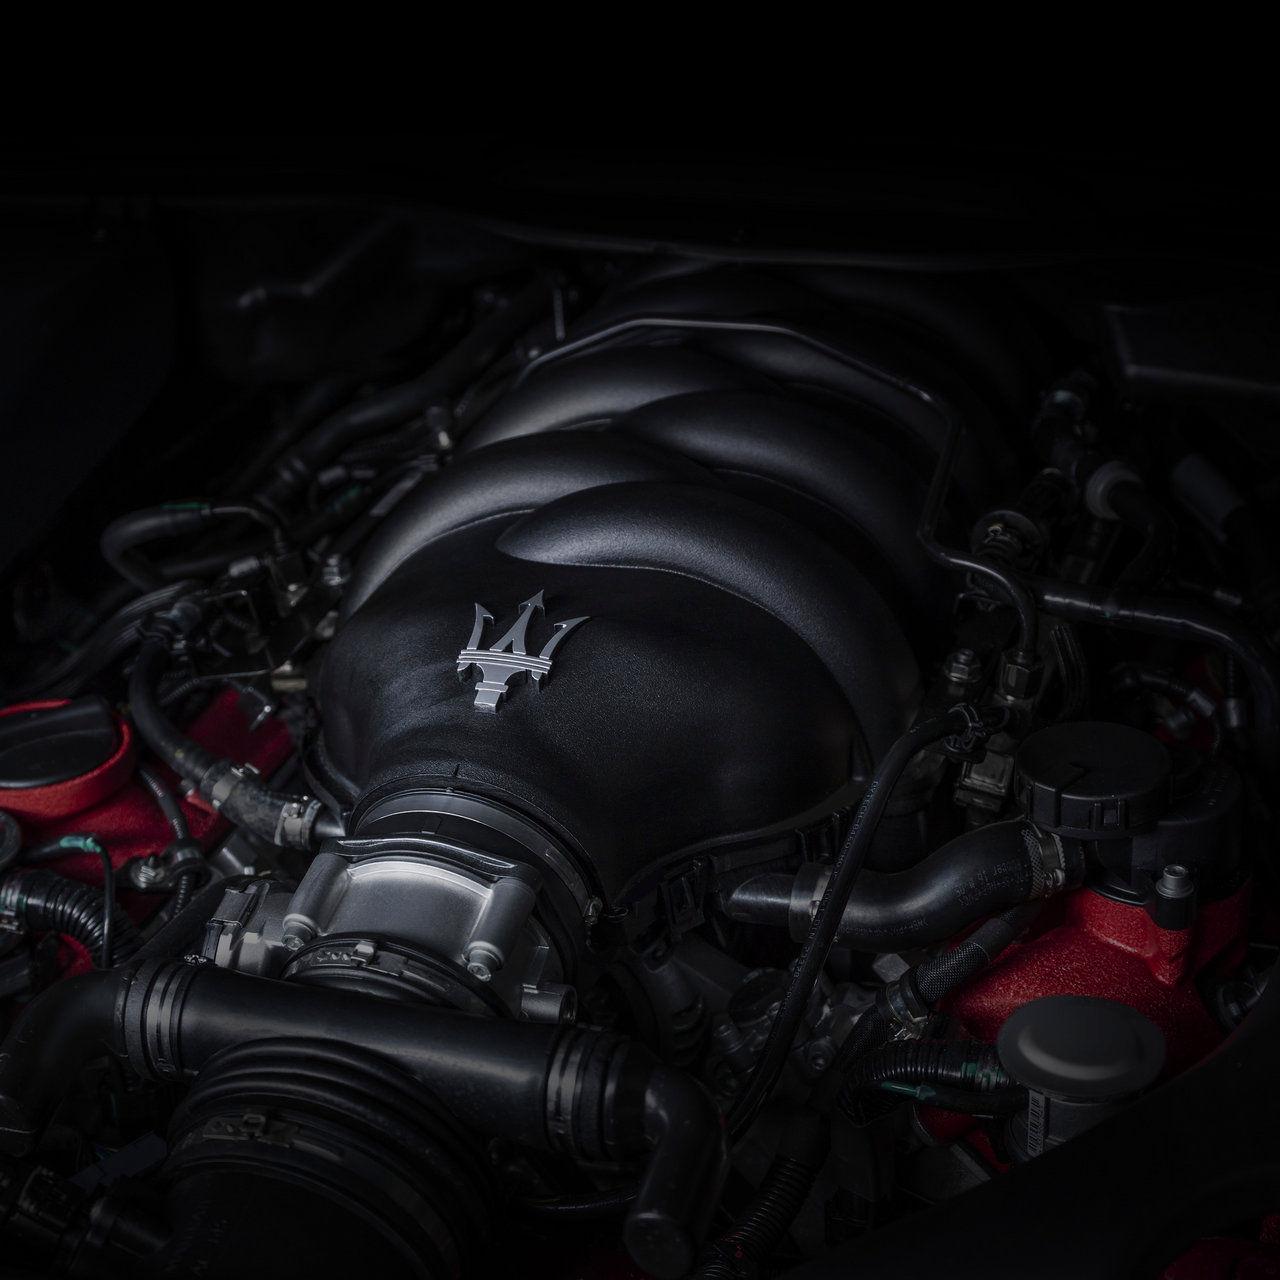 Maserati GranCabrio Motor Detail